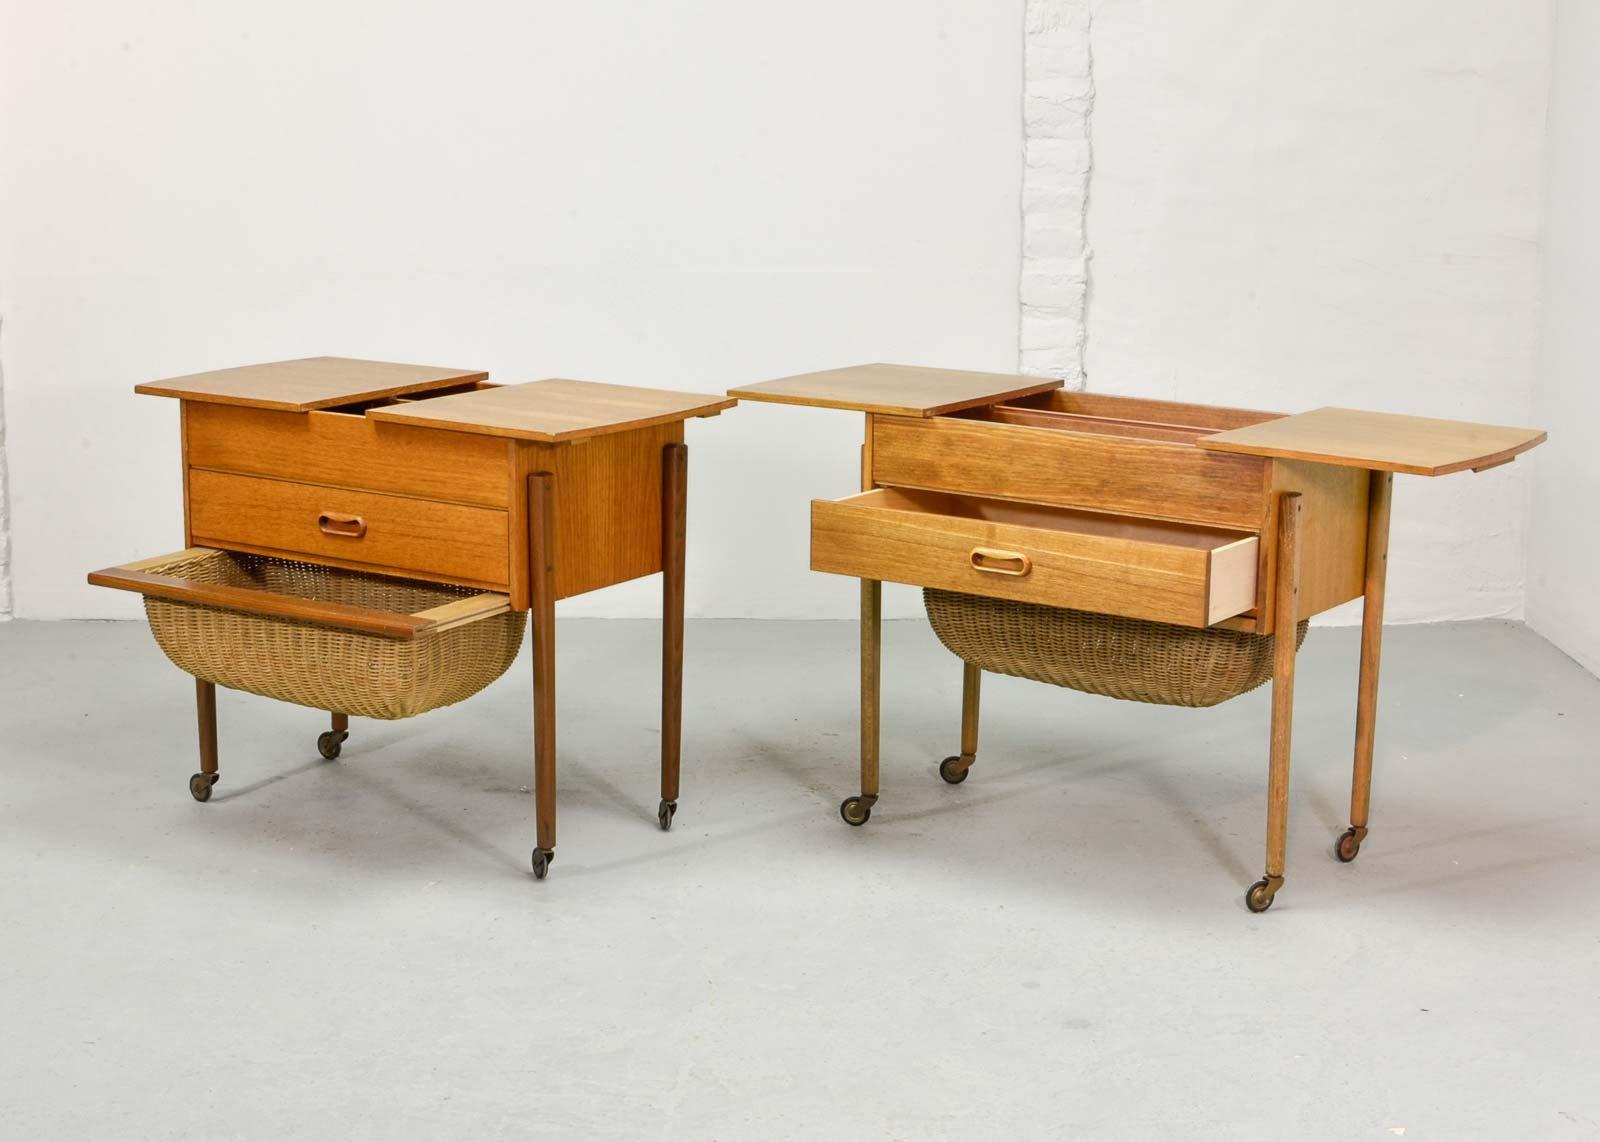 table de couture en teck massif danemark 1960s en vente sur pamono. Black Bedroom Furniture Sets. Home Design Ideas